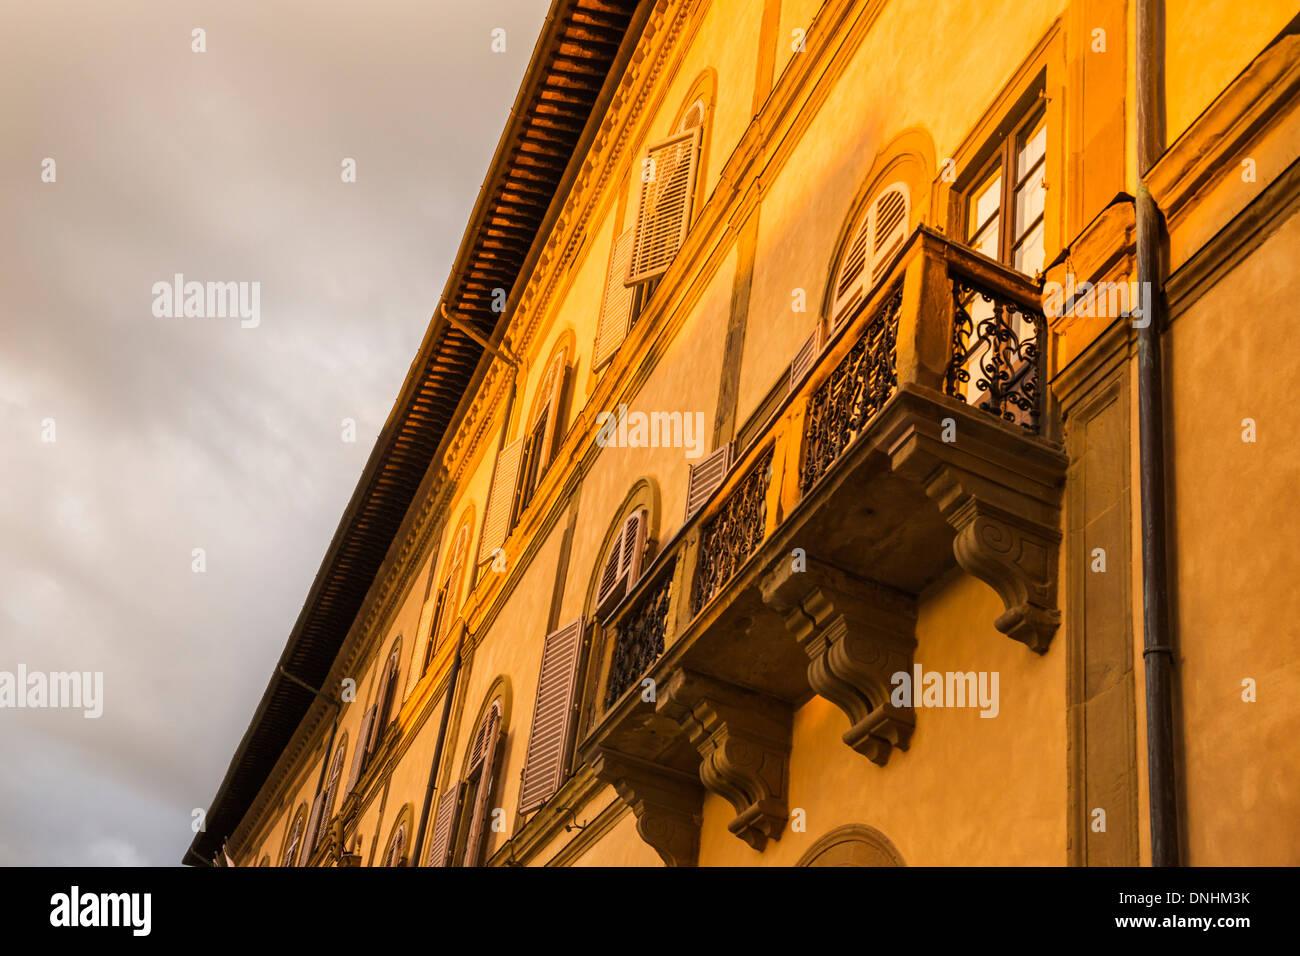 Niedrigen Winkel Blick auf einem denkmalgeschützten Gebäude, Siena, Provinz Siena, Toskana, Italien Stockbild